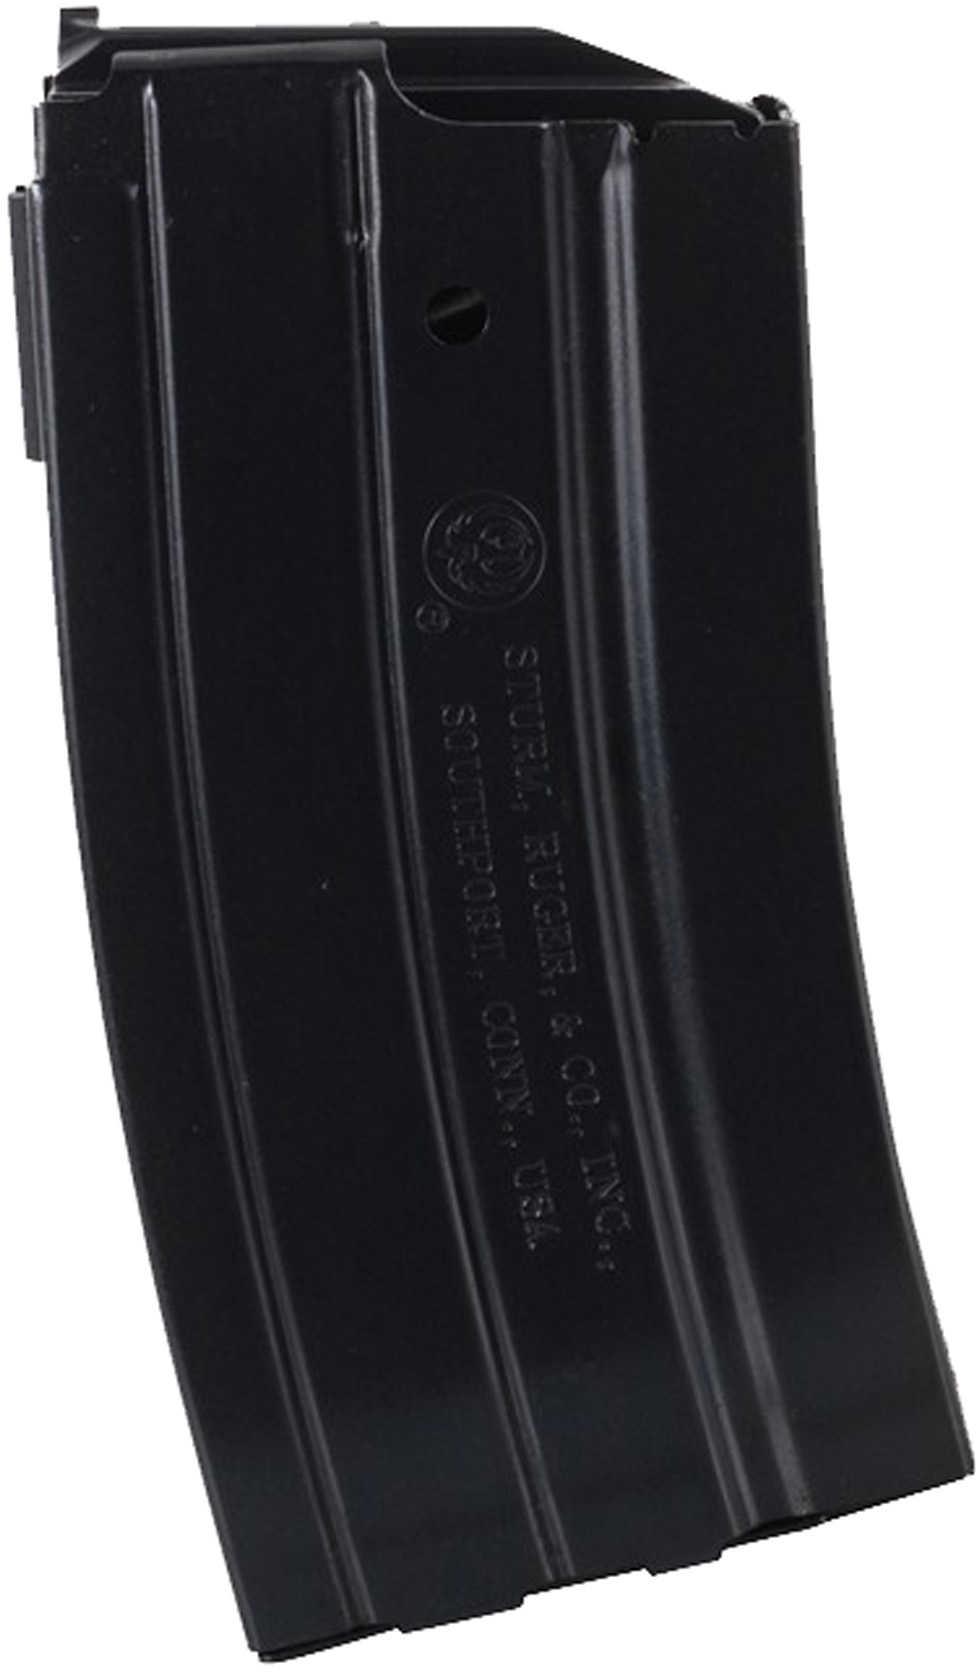 Ruger Magazine 223 Rem 20 Rounds Black Fits Mini-14 90010